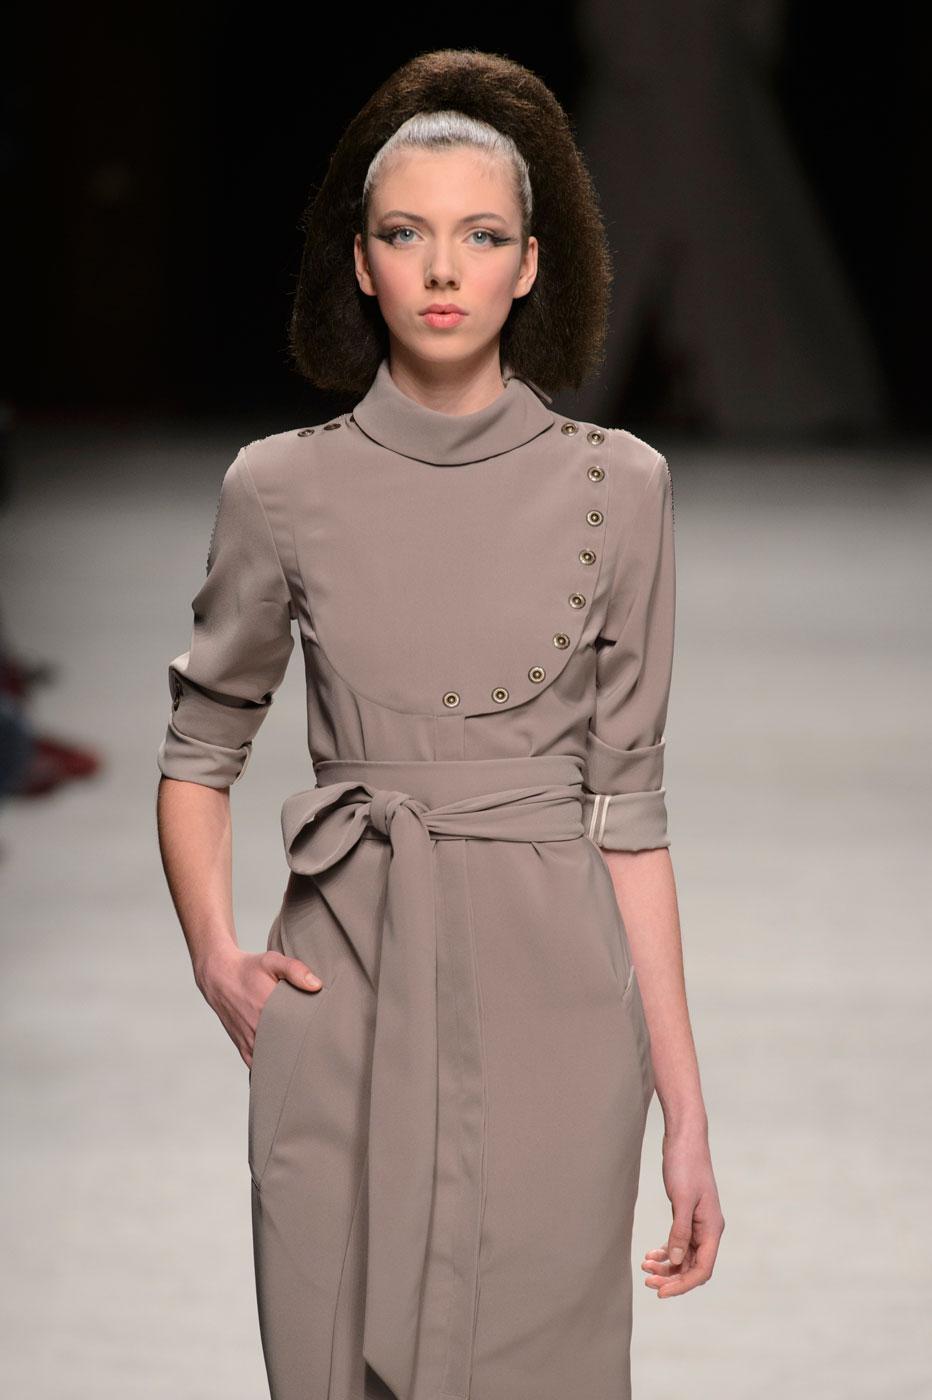 Julien-Fournie-Prive-fashion-runway-show-haute-couture-paris-spring-2015-the-impression-23